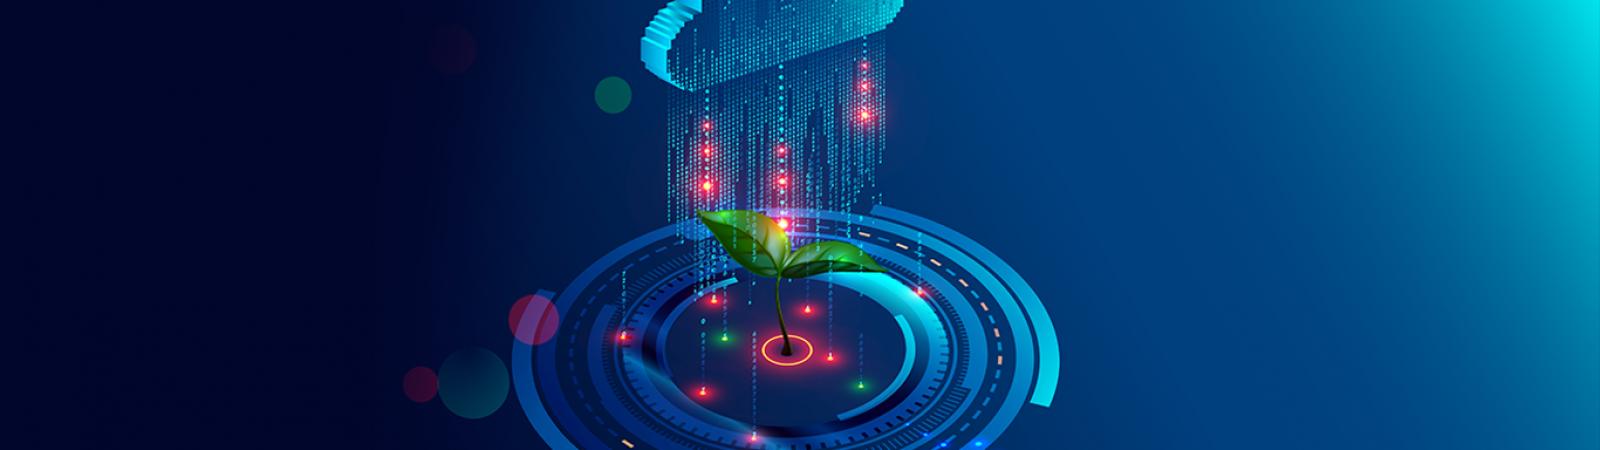 SAP-Analytics-Cloud-banner1